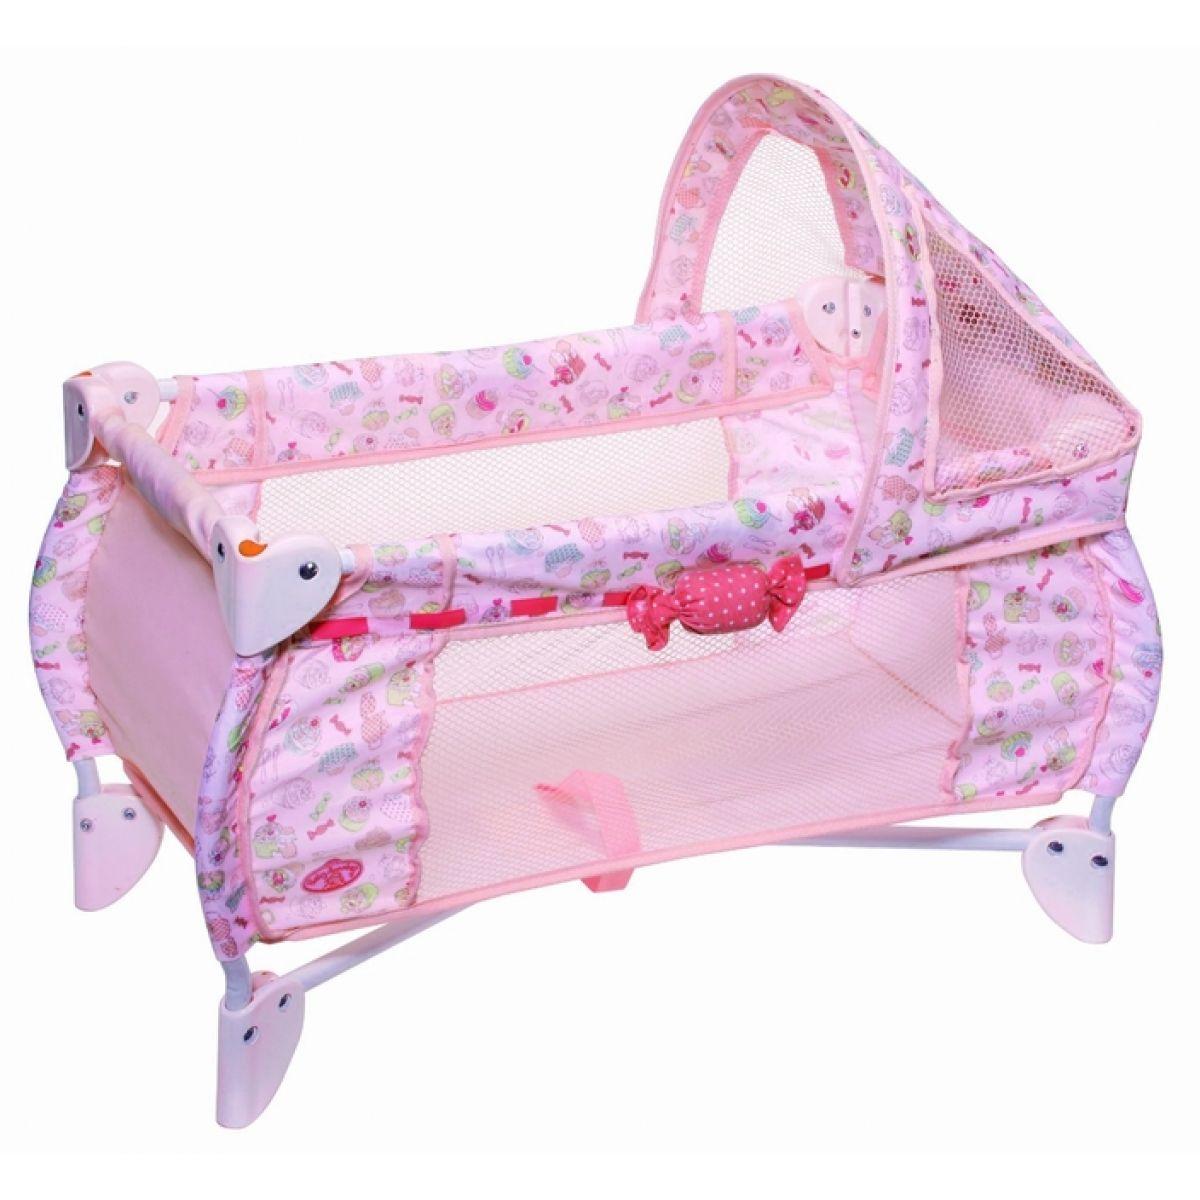 Baby Annabell 791073 - Skládací postýlka 2 v 1